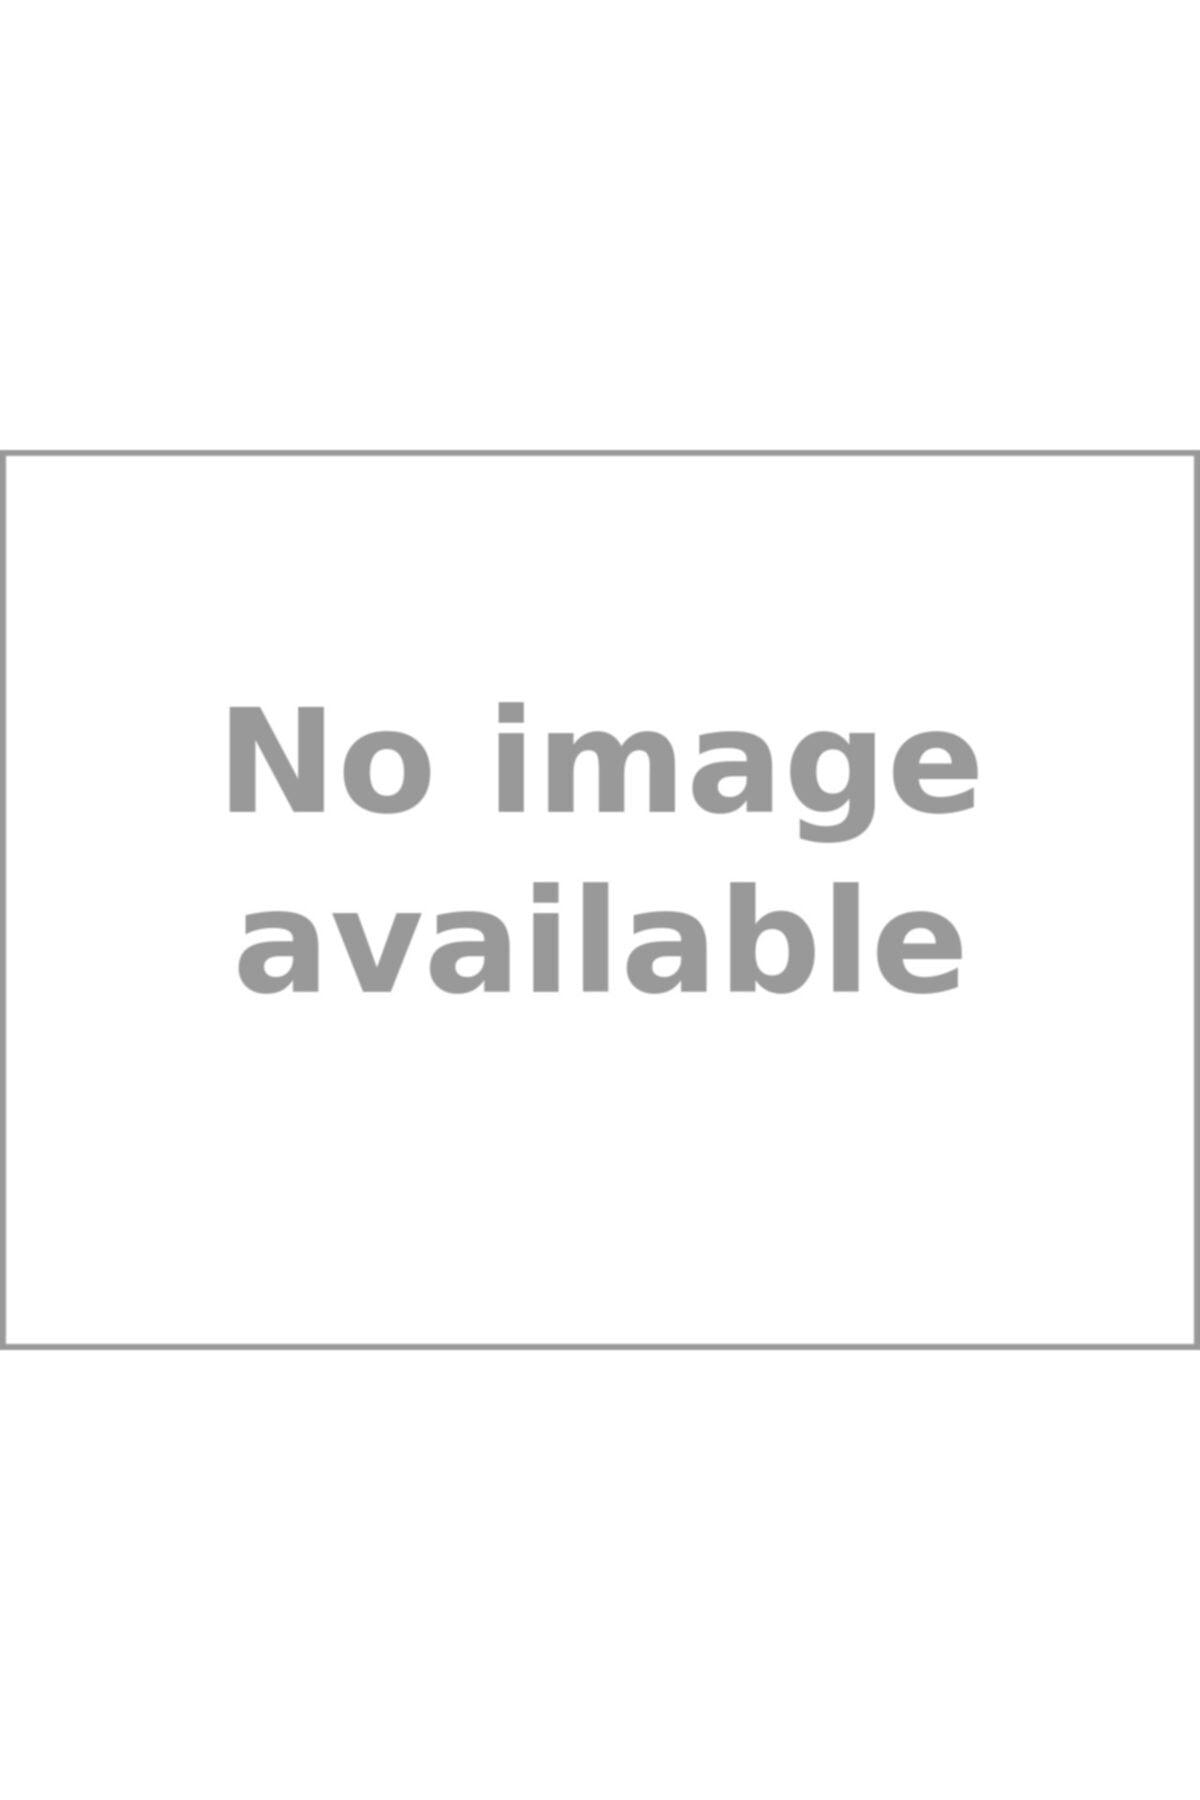 Orta Boy Kompakt - Pro Palette Medium Compact 773602391172